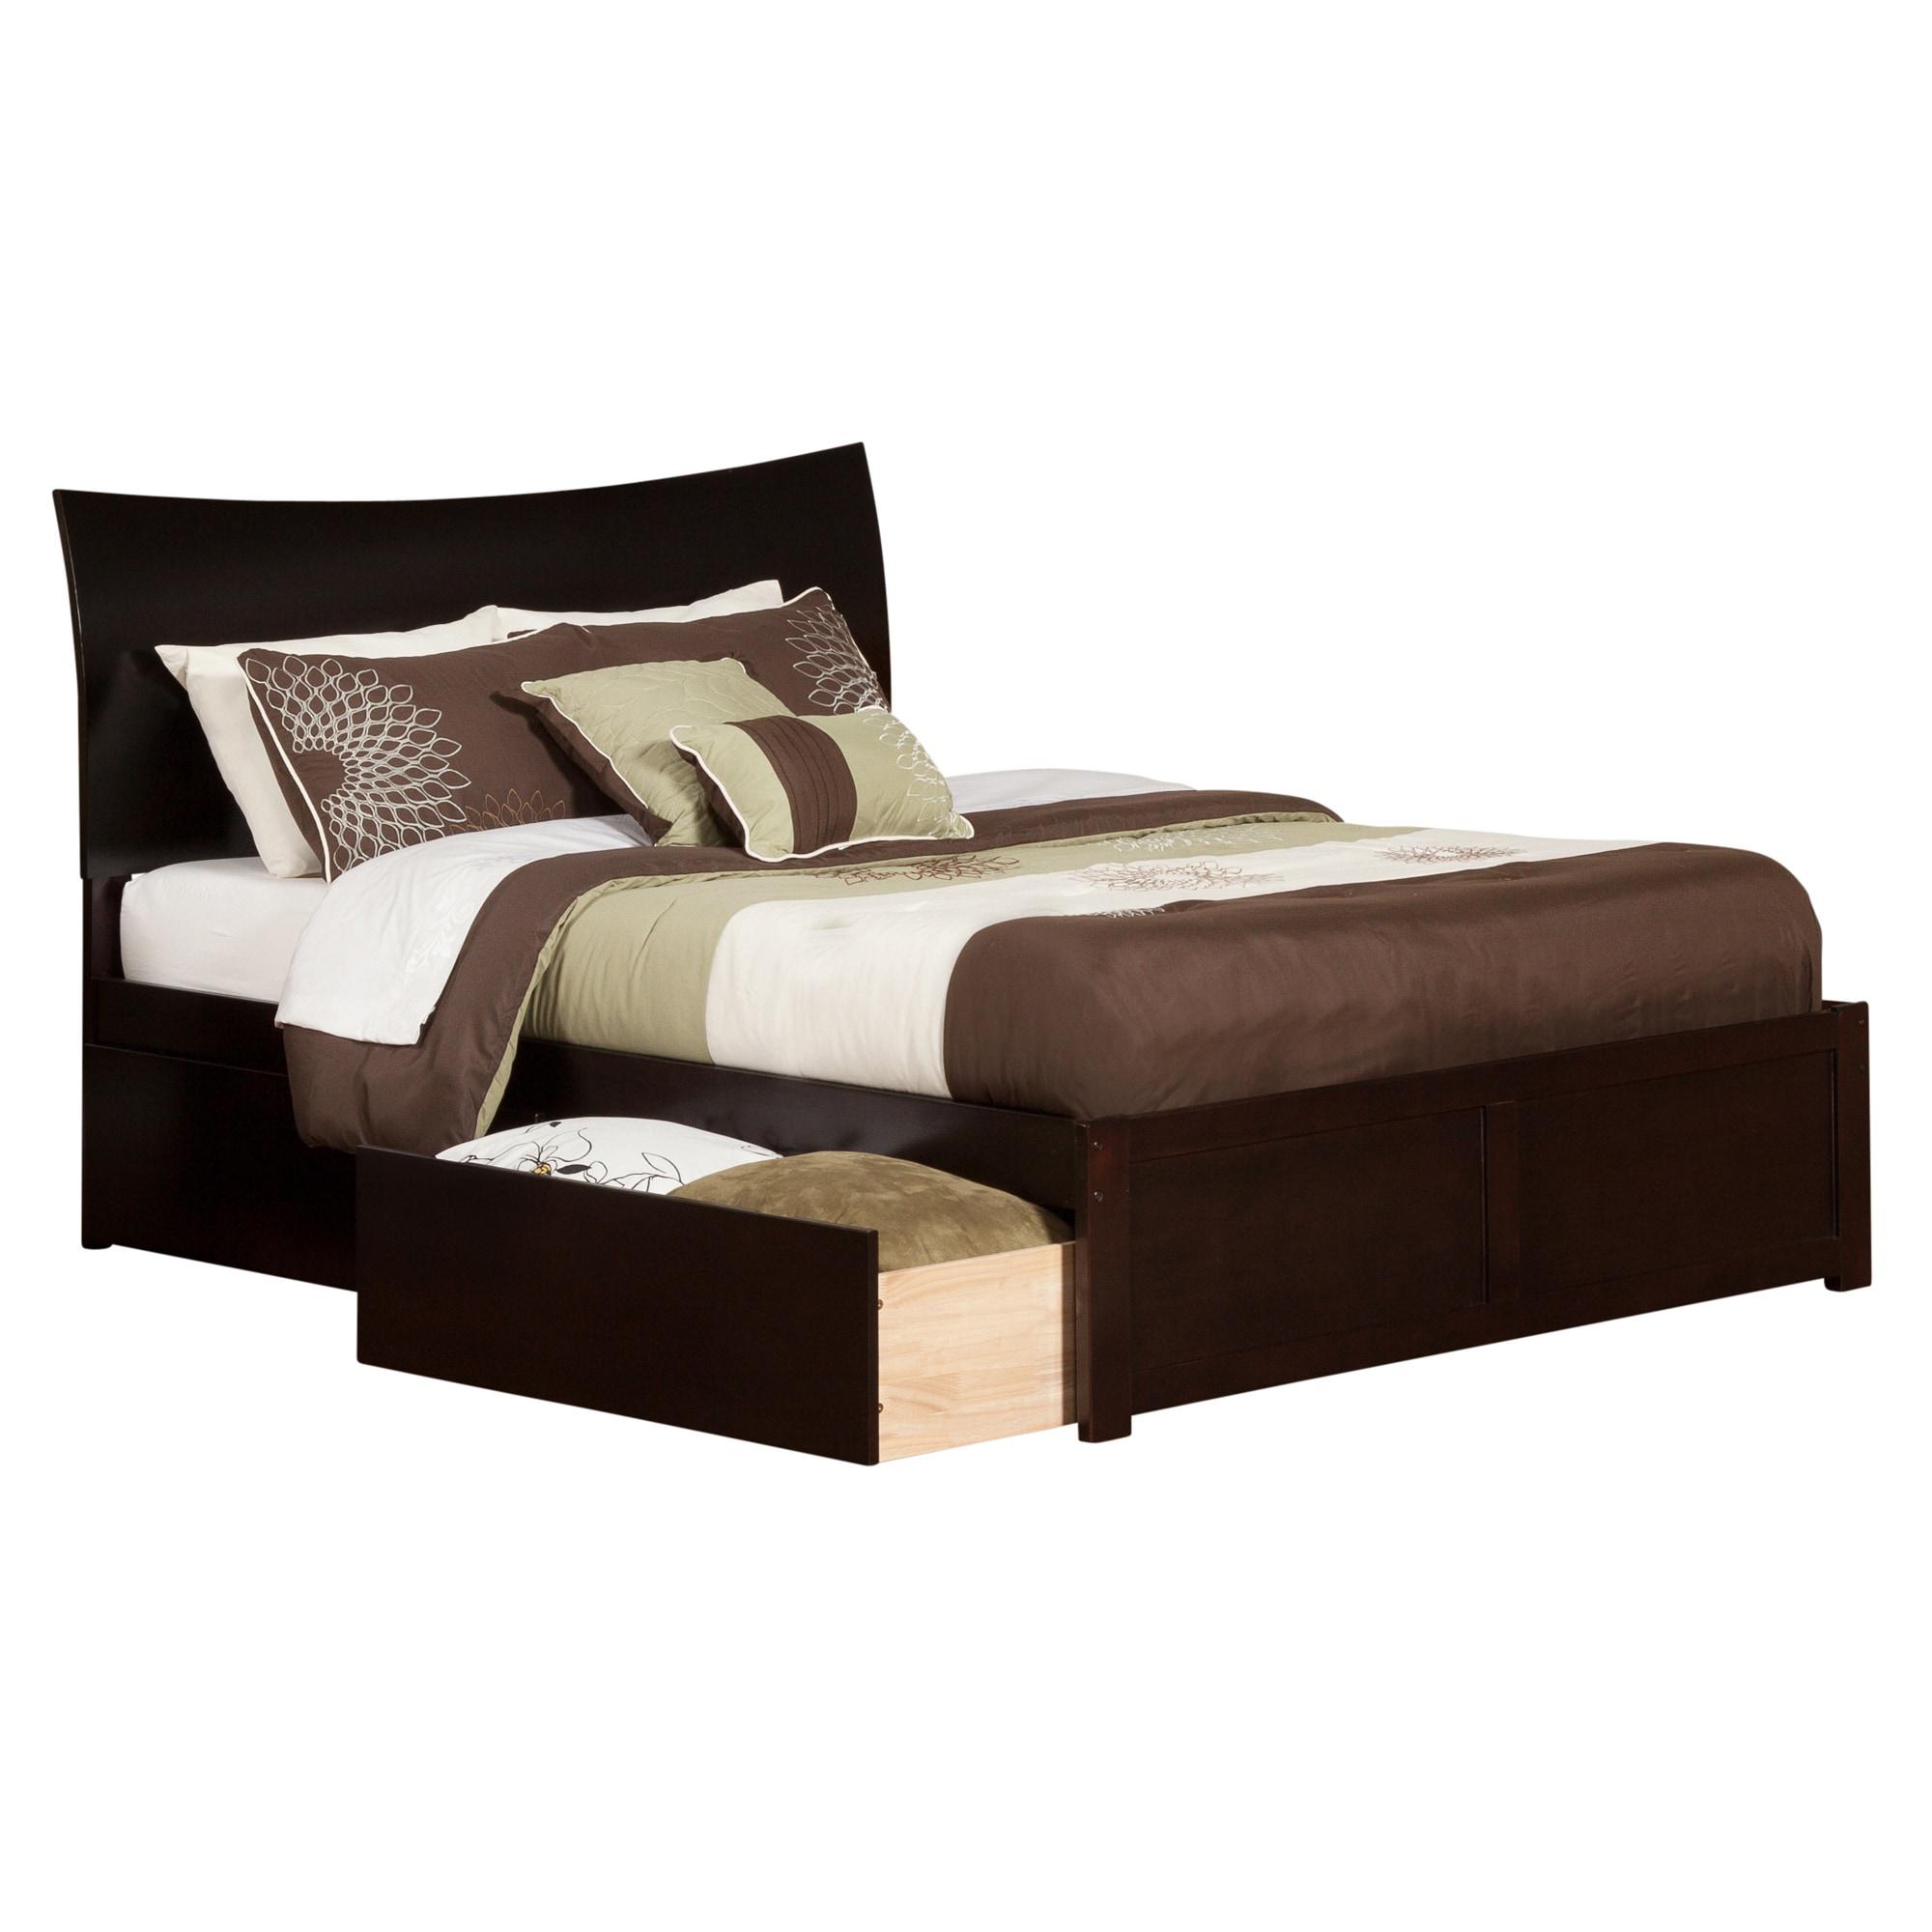 Atlantic Furniture Soho Espresso Brown Wood Queen-sized F...